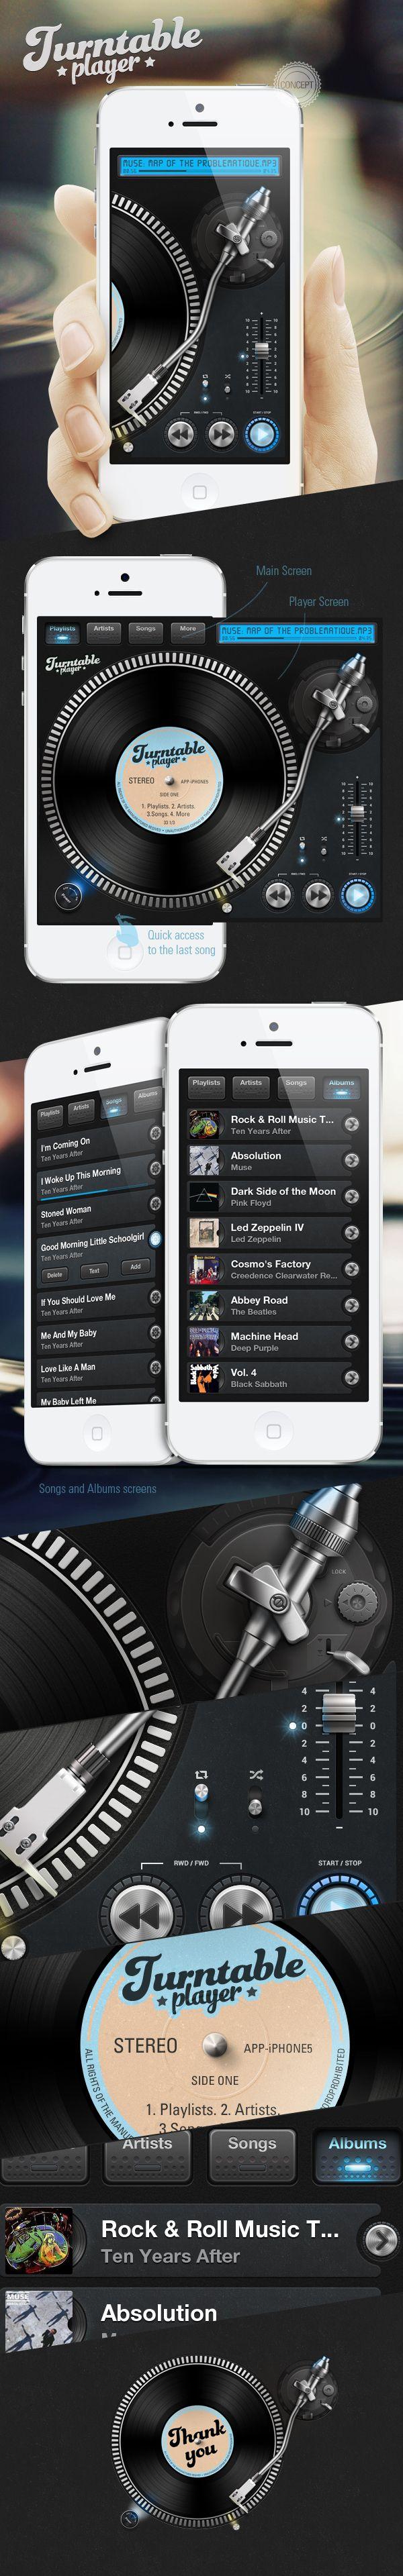 Turntable Player iPhone App Concept by Ivan Gapeev, via Behance